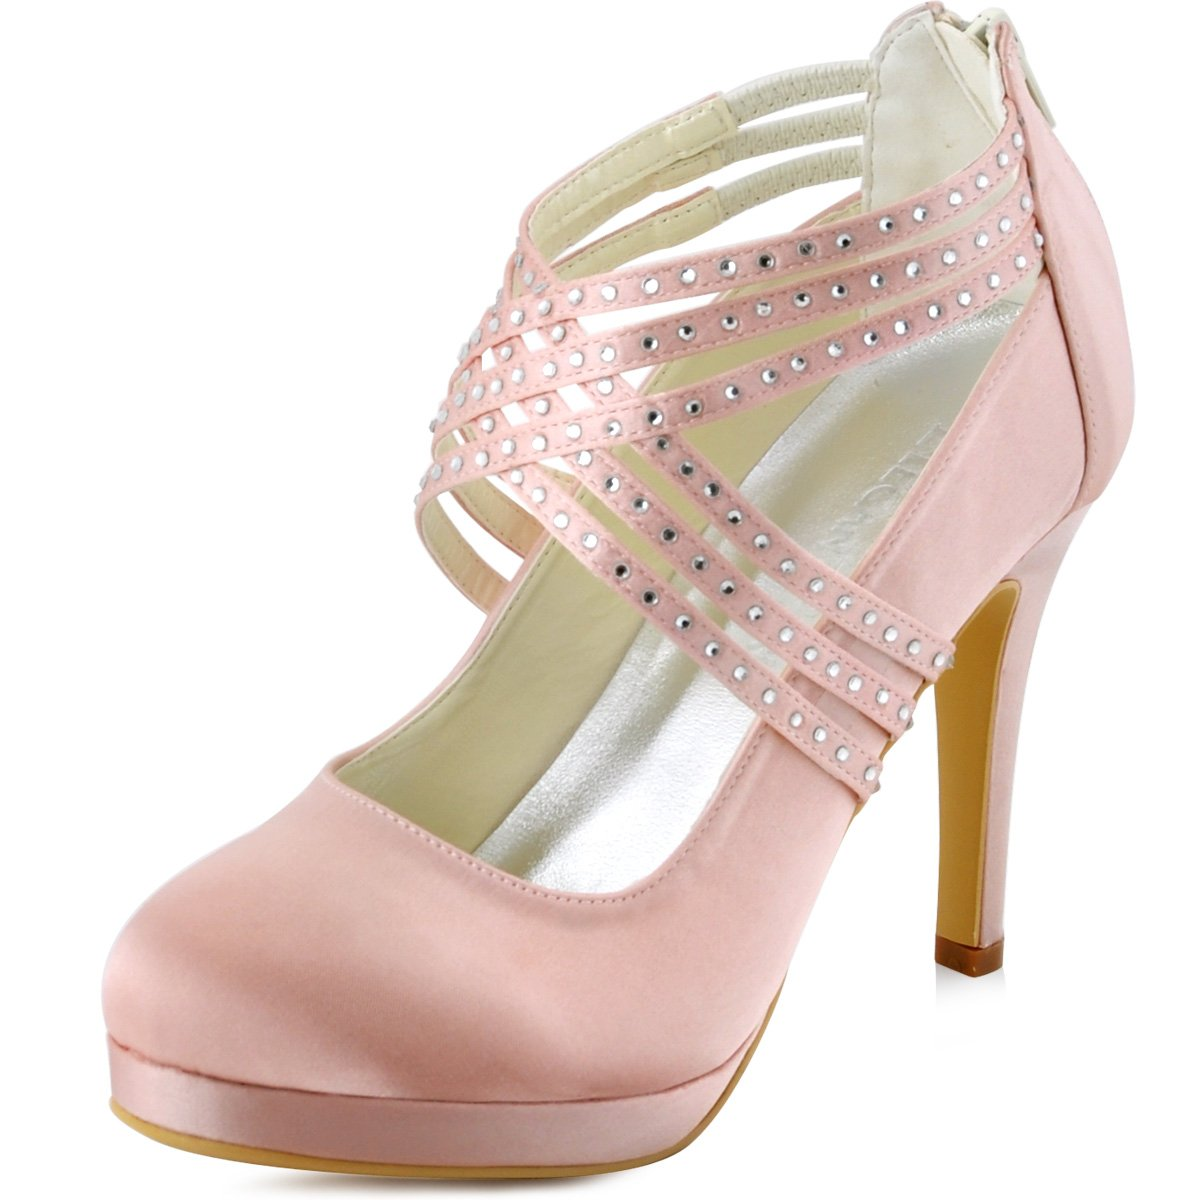 ElegantPark Women High Heel Pumps Closed Toe Platform Strappy Satin Evening Prom Dress Wedding Shoes B011B276OS 7 B(M) US Pink